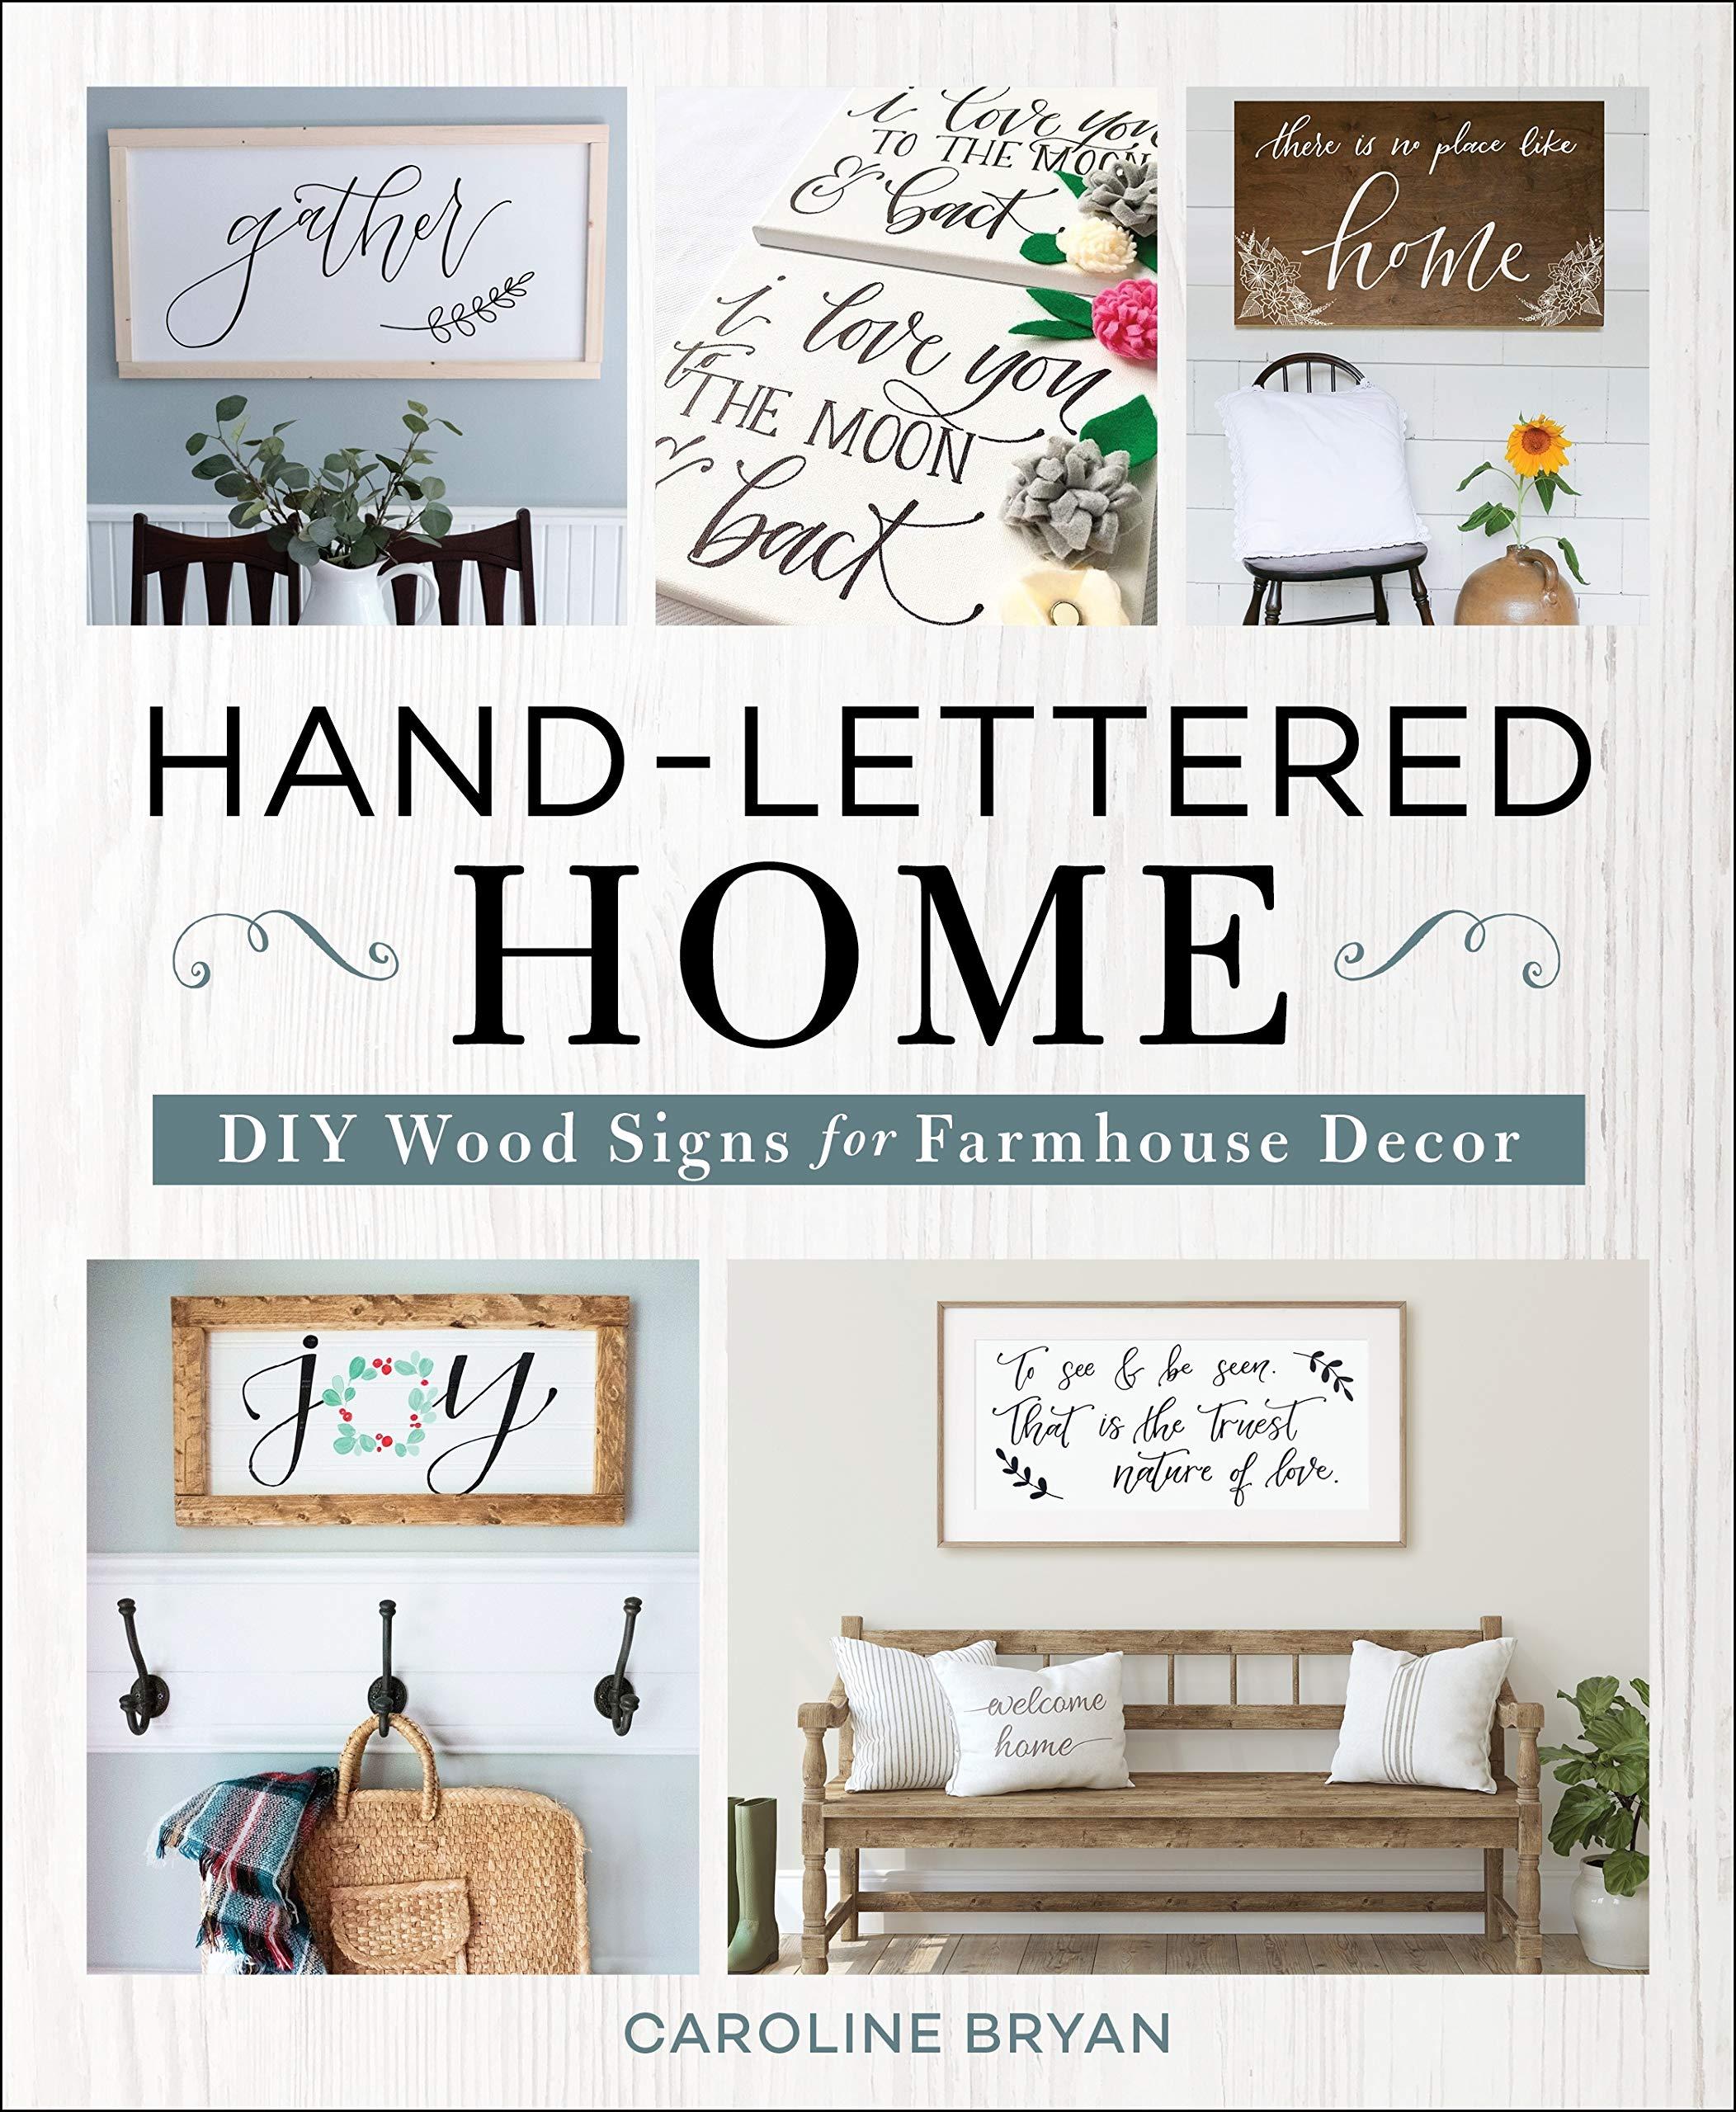 Hand Lettered Home Diy Wood Signs For Farmhouse Decor Bryan Caroline 9781250270641 Amazon Com Books